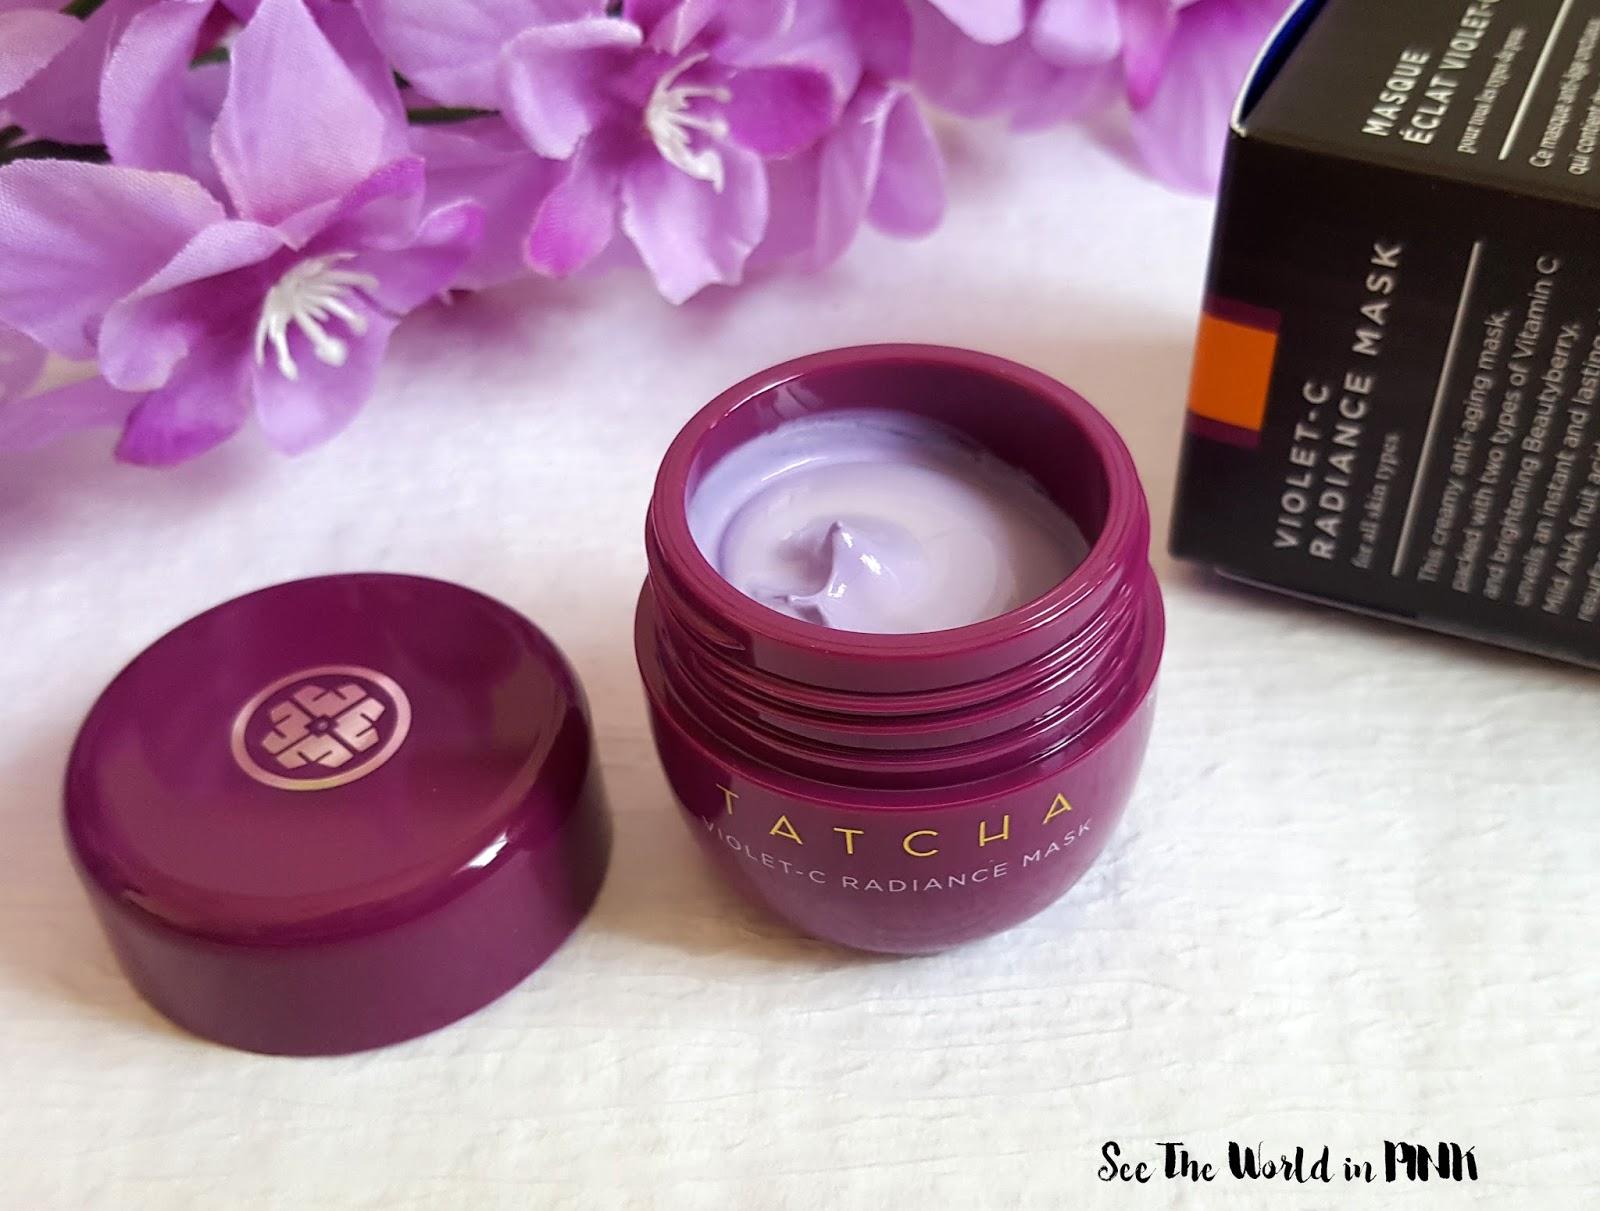 Mask Wednesday - New Tatcha Violet-C Radiance Mask Review!